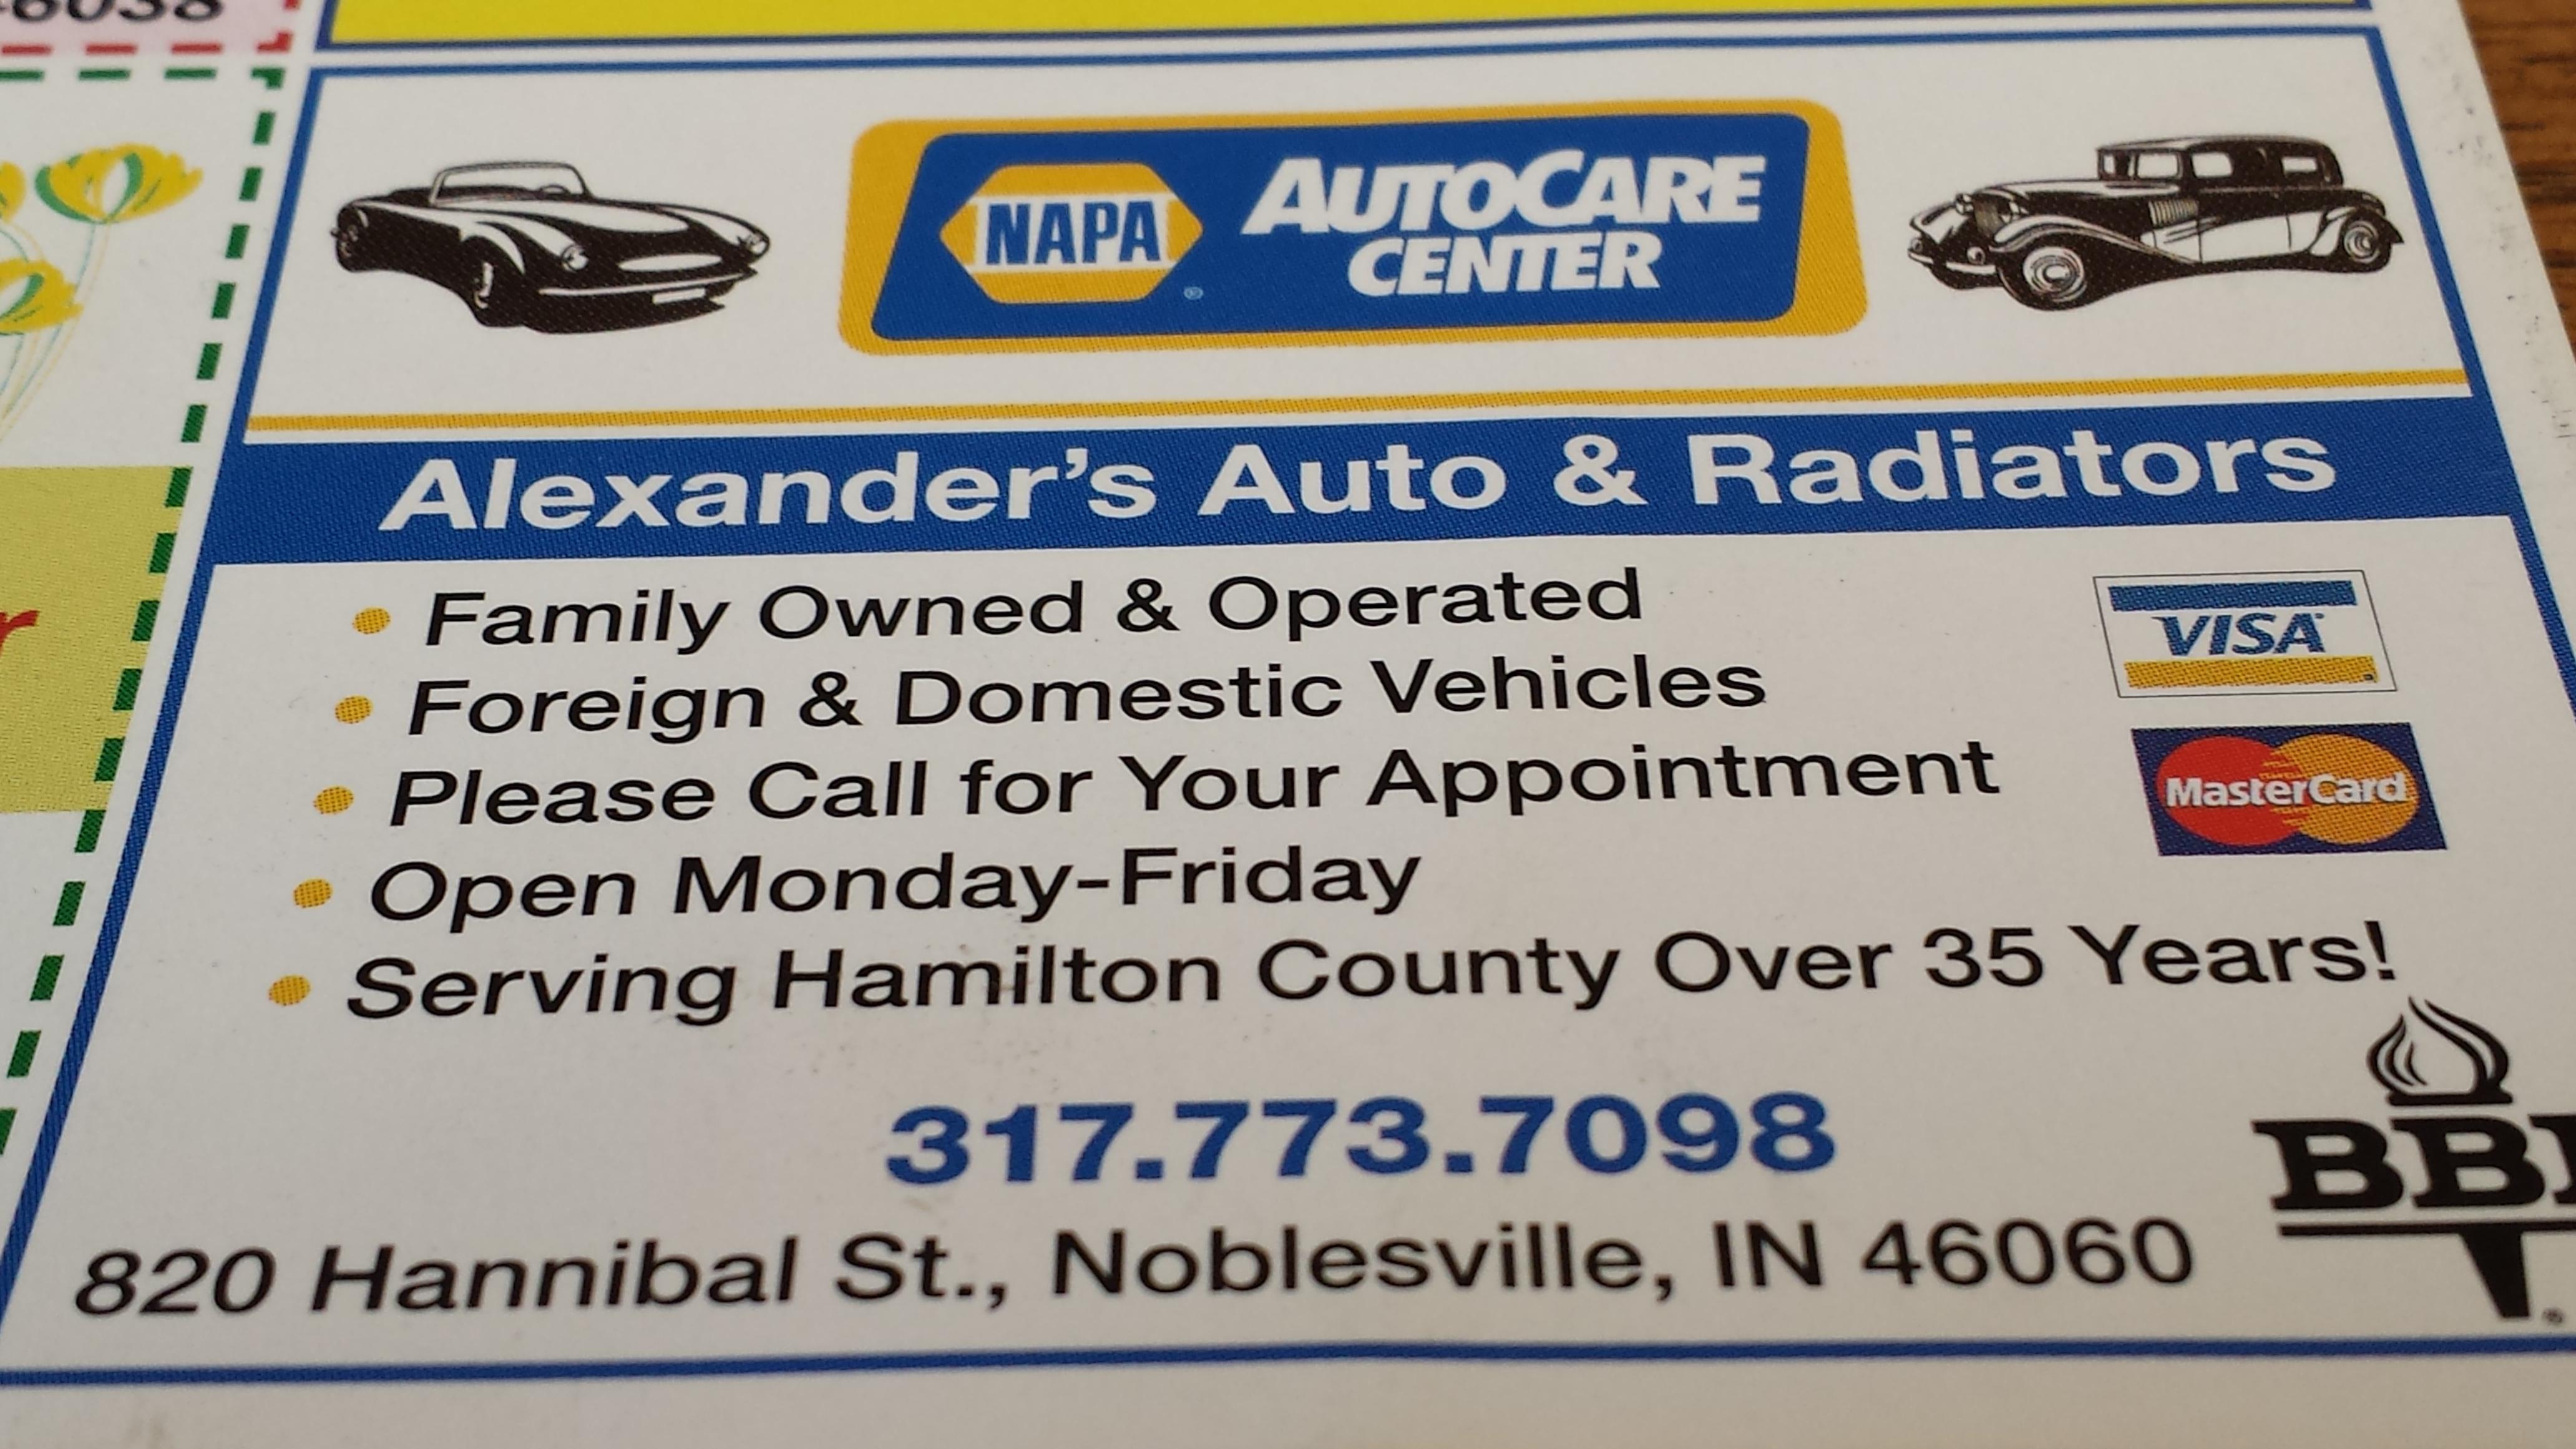 Alexander's Auto & Radiator Repair image 4